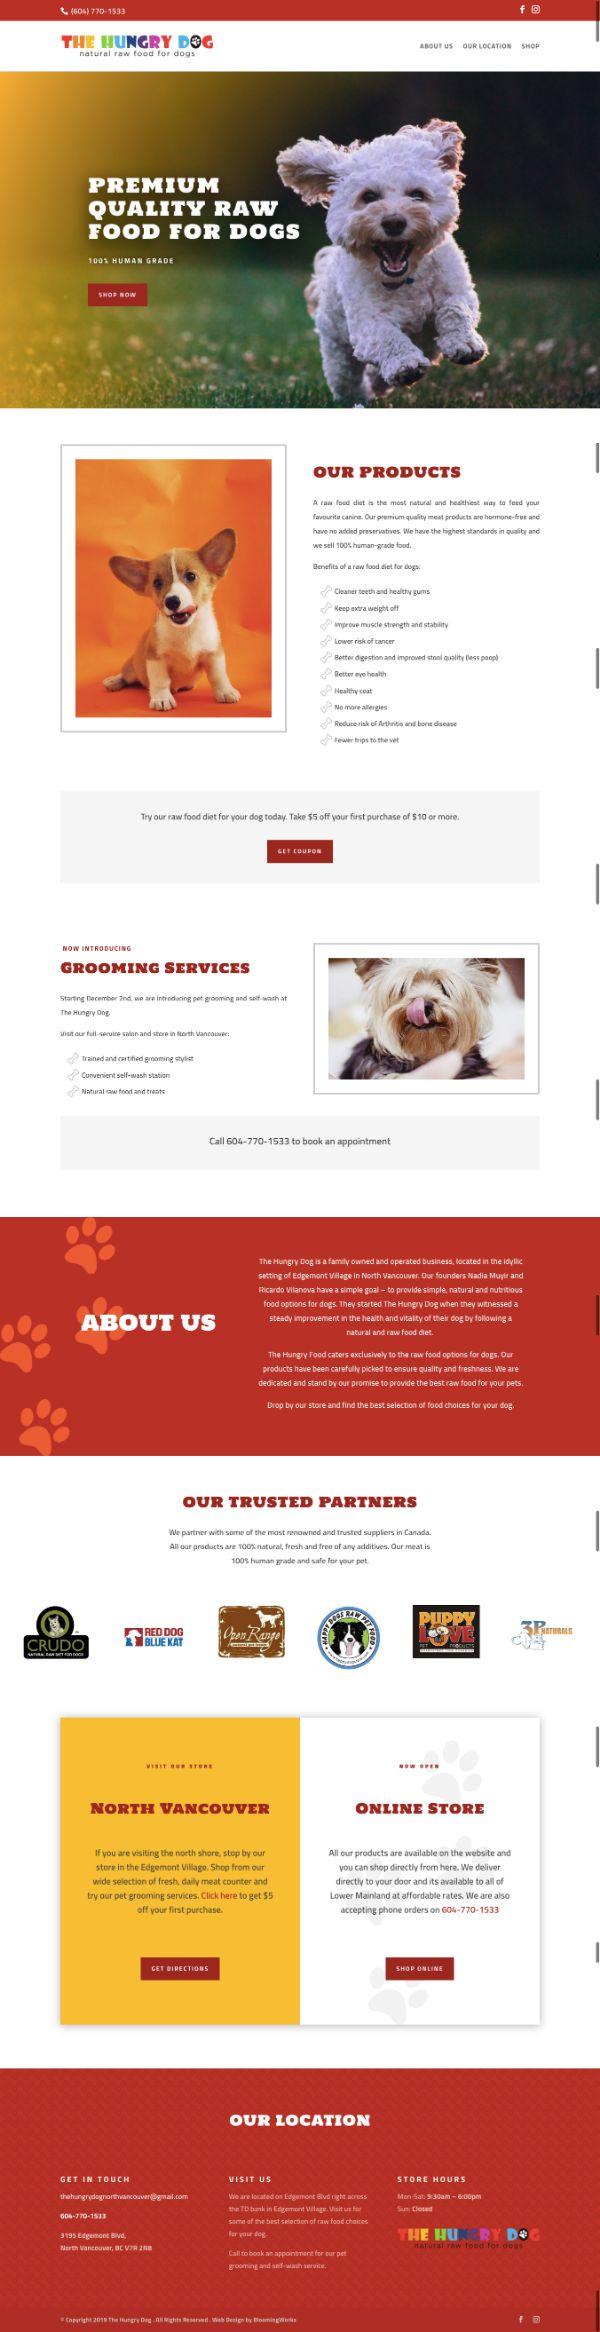 WordPress eCommerce store web design